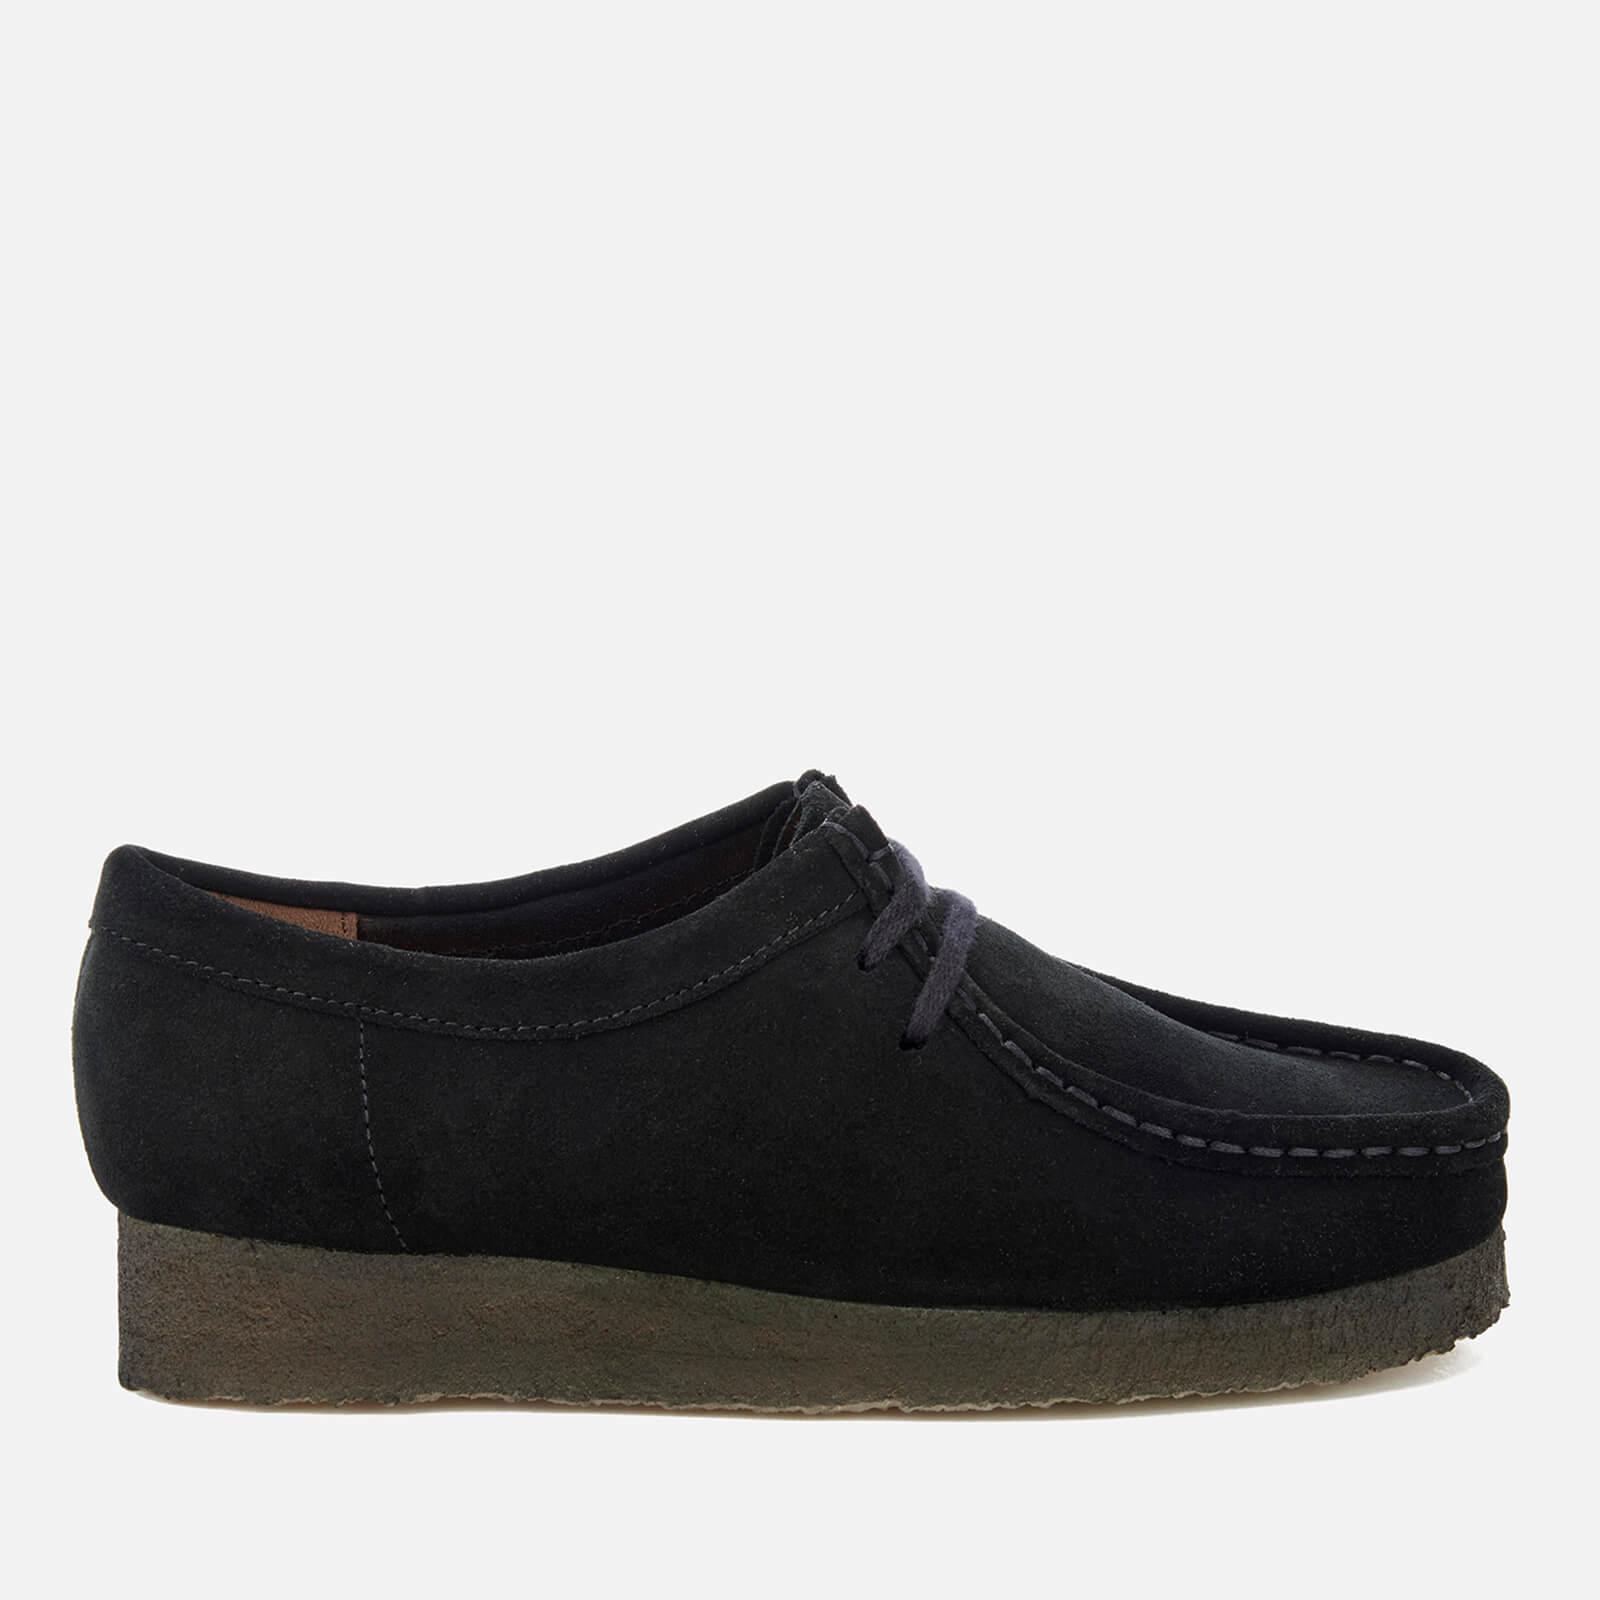 Clarks Originals Women's Wallabee Shoes - Black Suede - UK 7 - Black